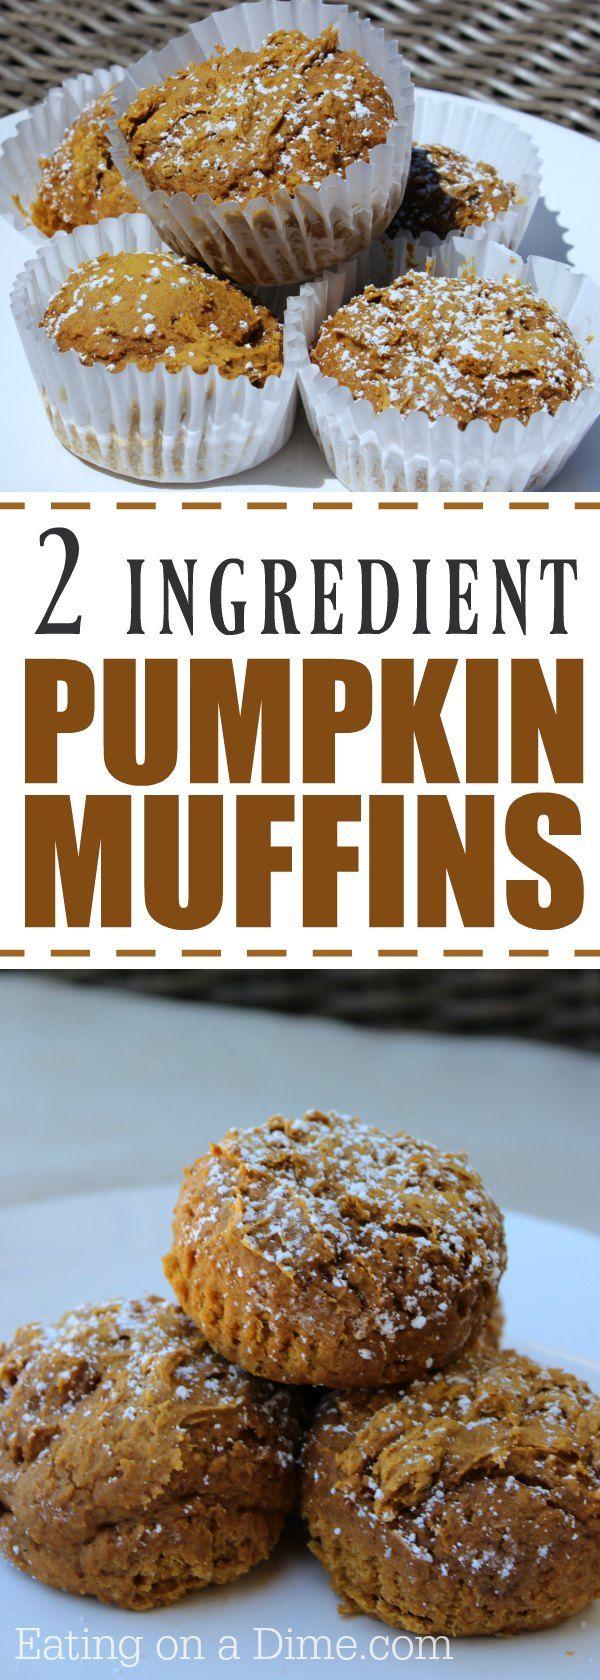 Easy fresh pumpkin muffin recipe